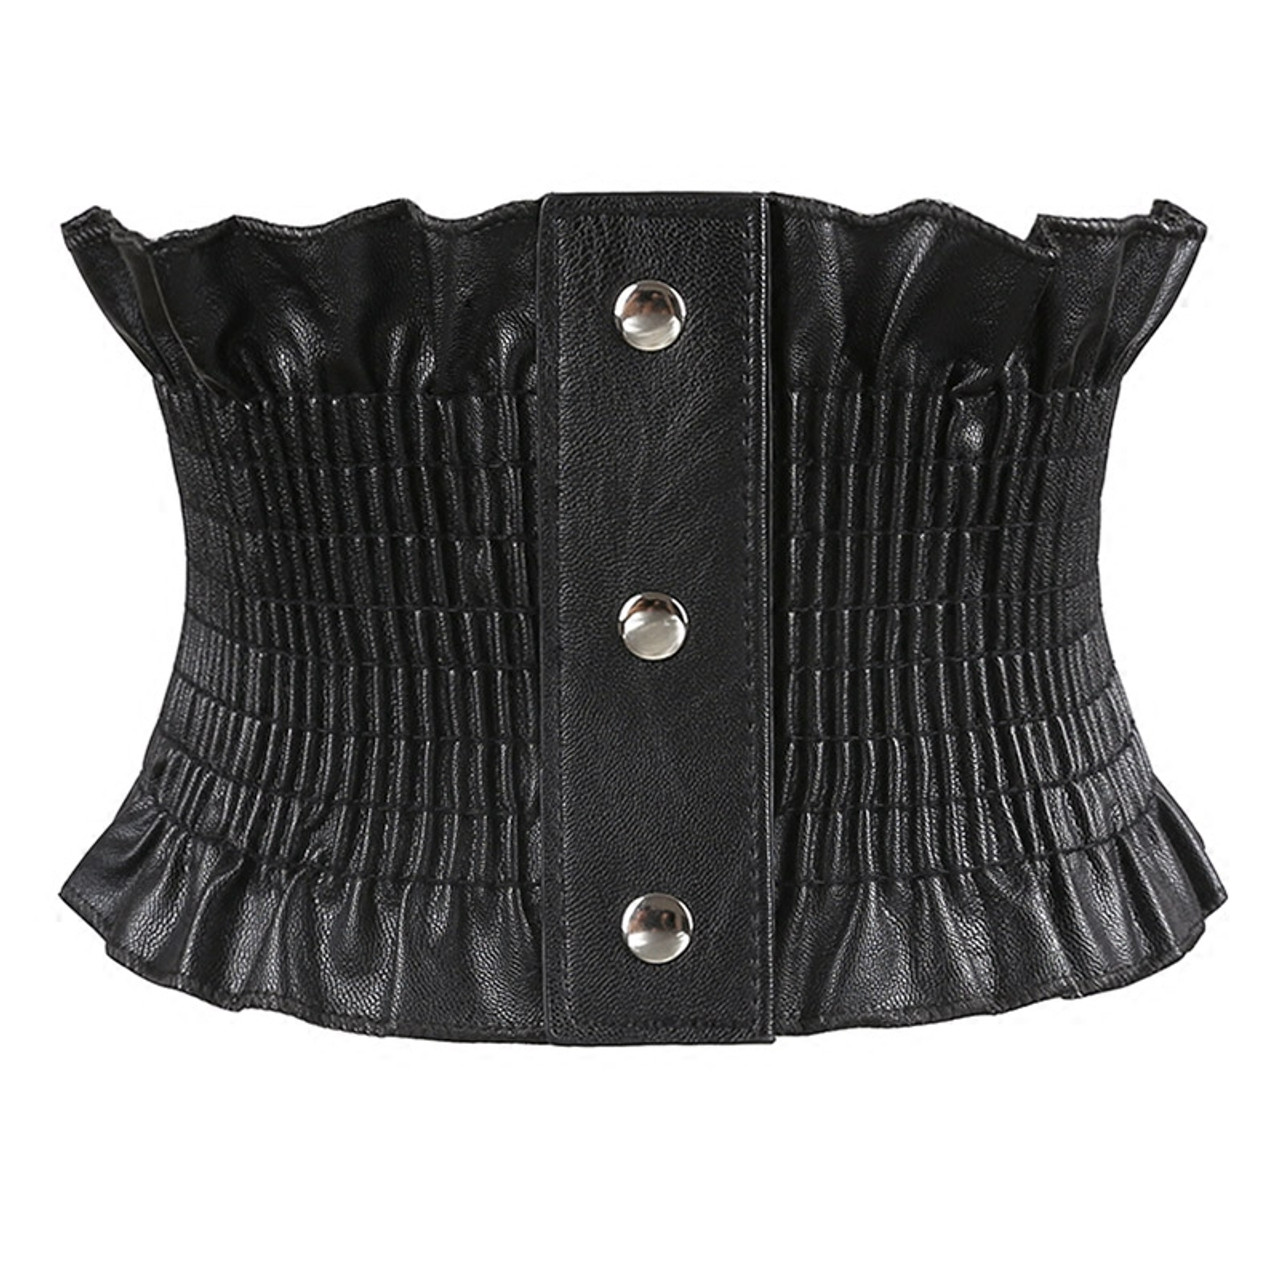 Fashion 3 Inch Wide Buckle Stretch Elastic Corset Waist Belt Black Party Show